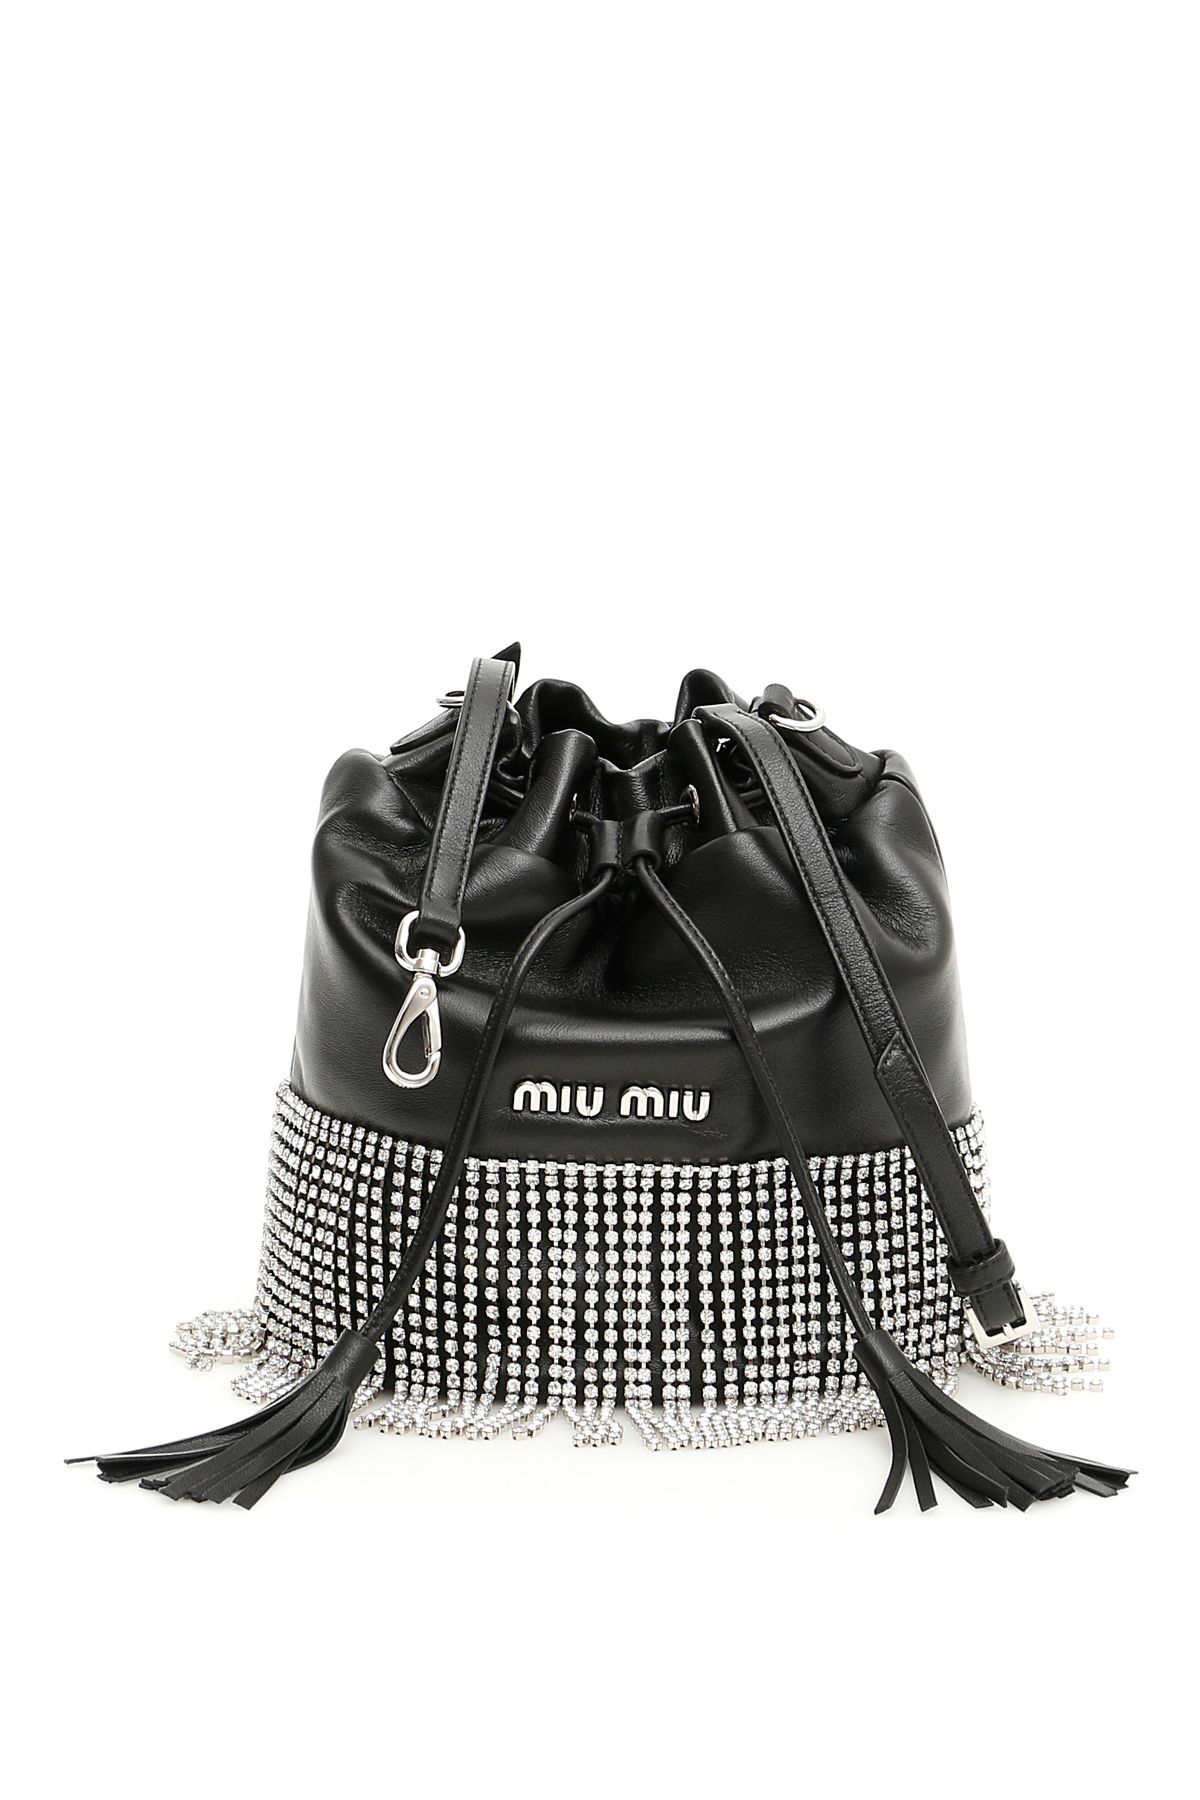 bac34893011 Miu Miu London Night Crystal-Embellished Leather Bucket Bag In Black ...